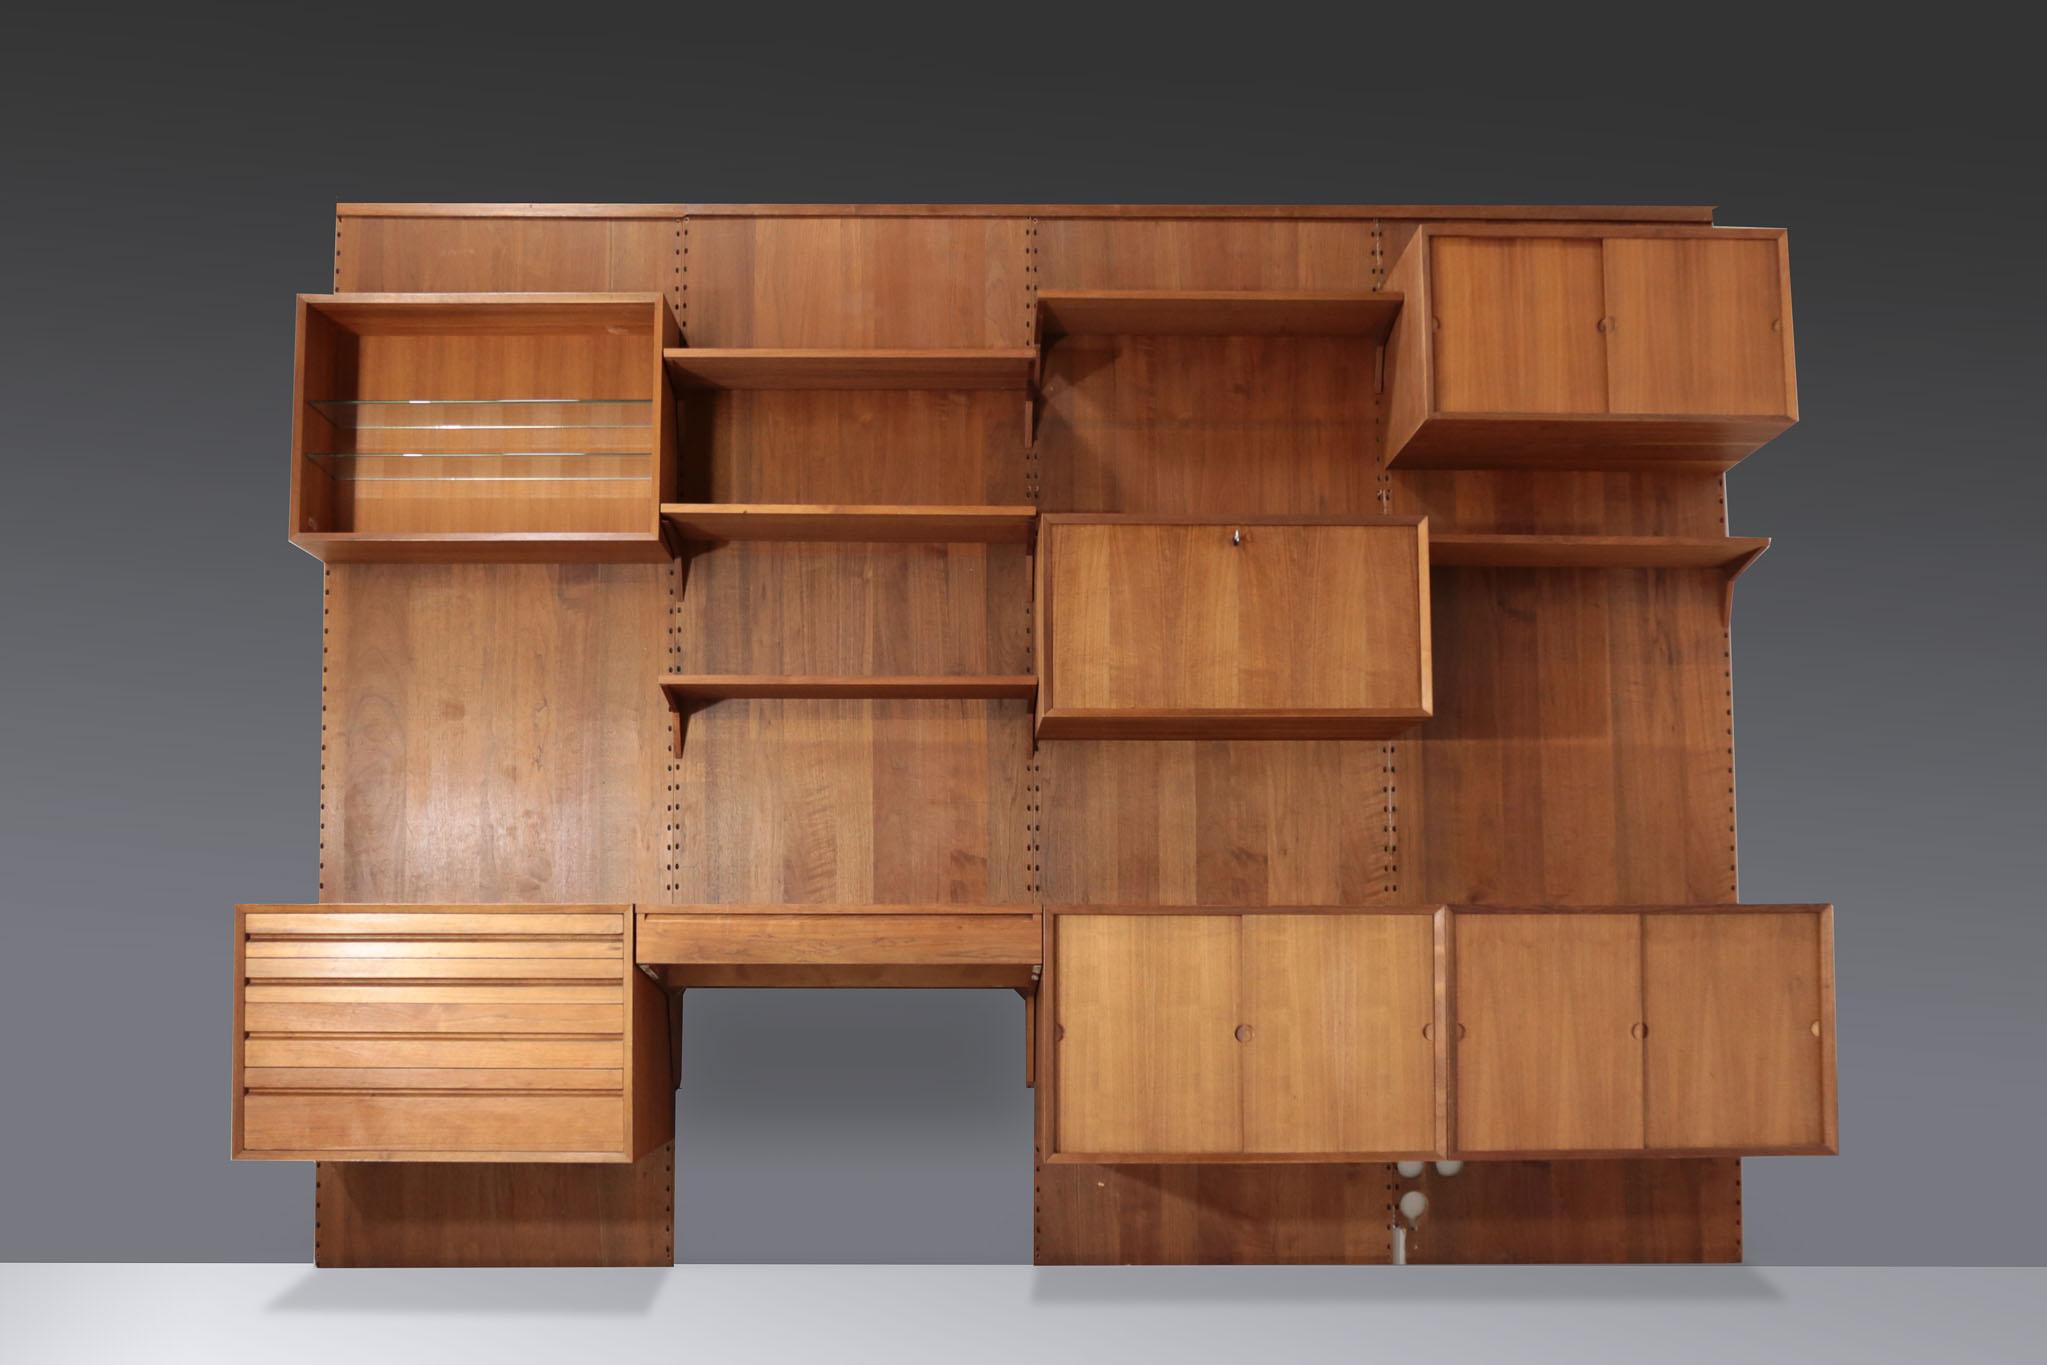 bibliotheque murale danoise poul cadovius noyer vintage scandinave danke galerie. Black Bedroom Furniture Sets. Home Design Ideas